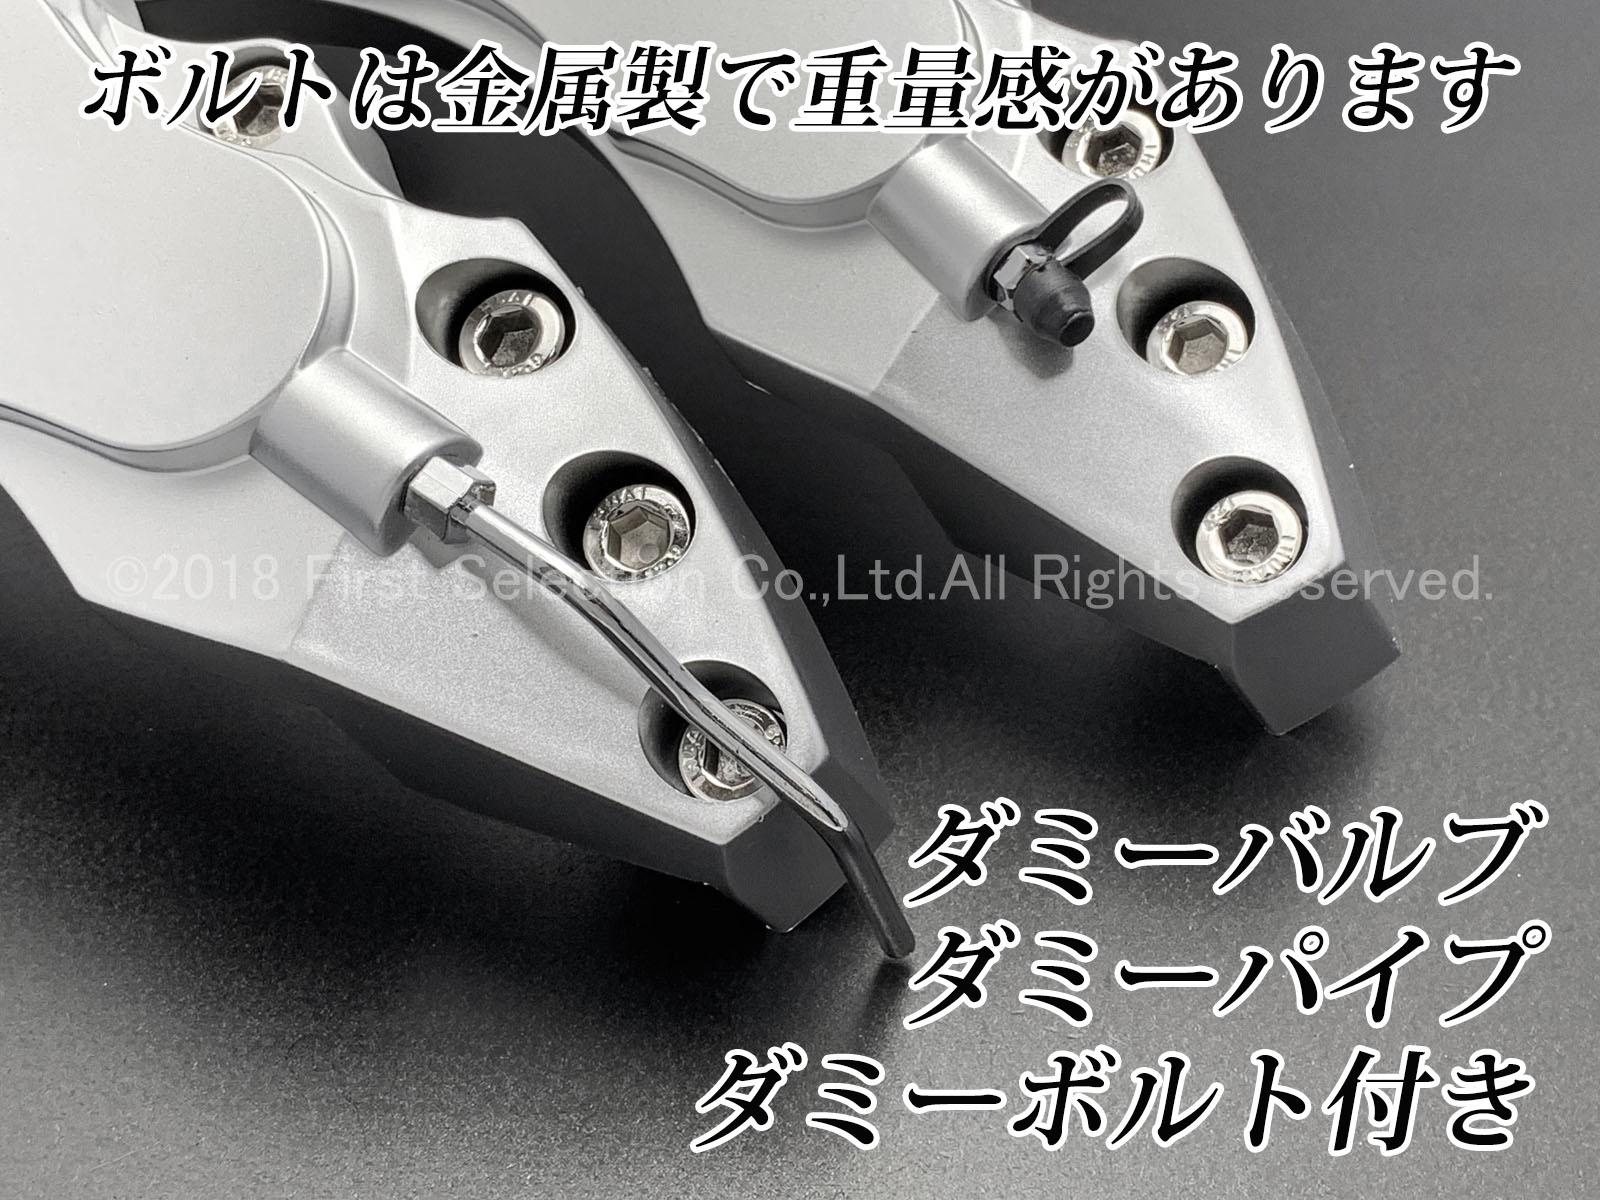 BMW車 ///M黒文字 汎用高品質キャリパーカバーL/Mサイズセット 銀 シルバー